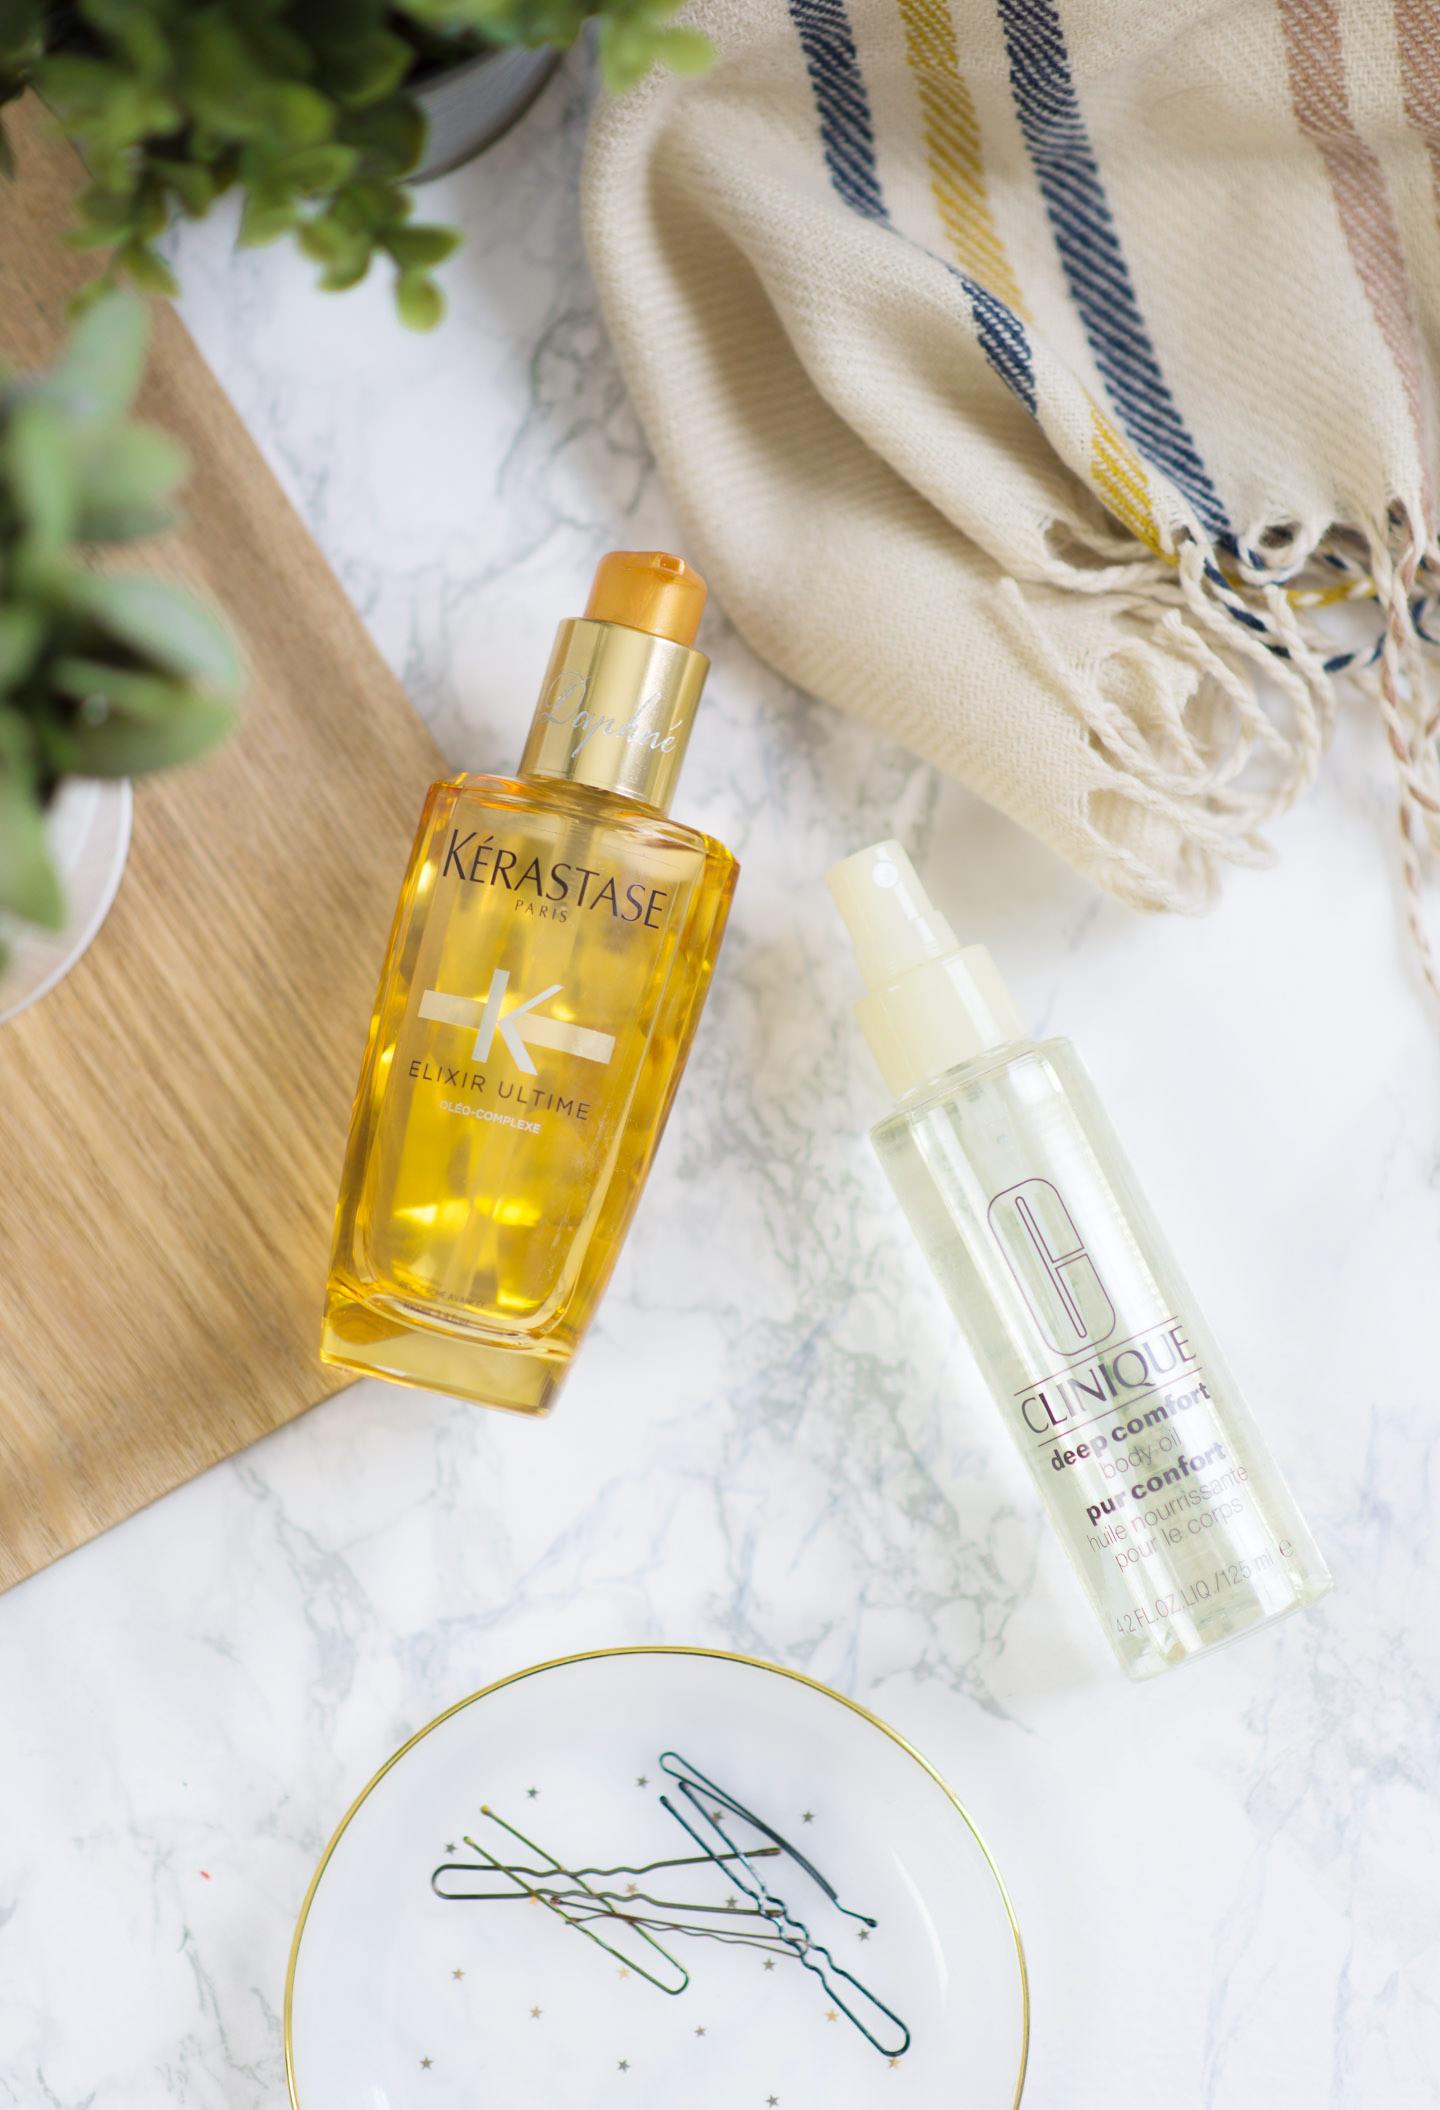 Blog-Mode-Mode-And-The-City-Favoris-Beaute-6-Kerastase-Elixir-Ultime-Clinique-huile-corps-deep-comfort copie